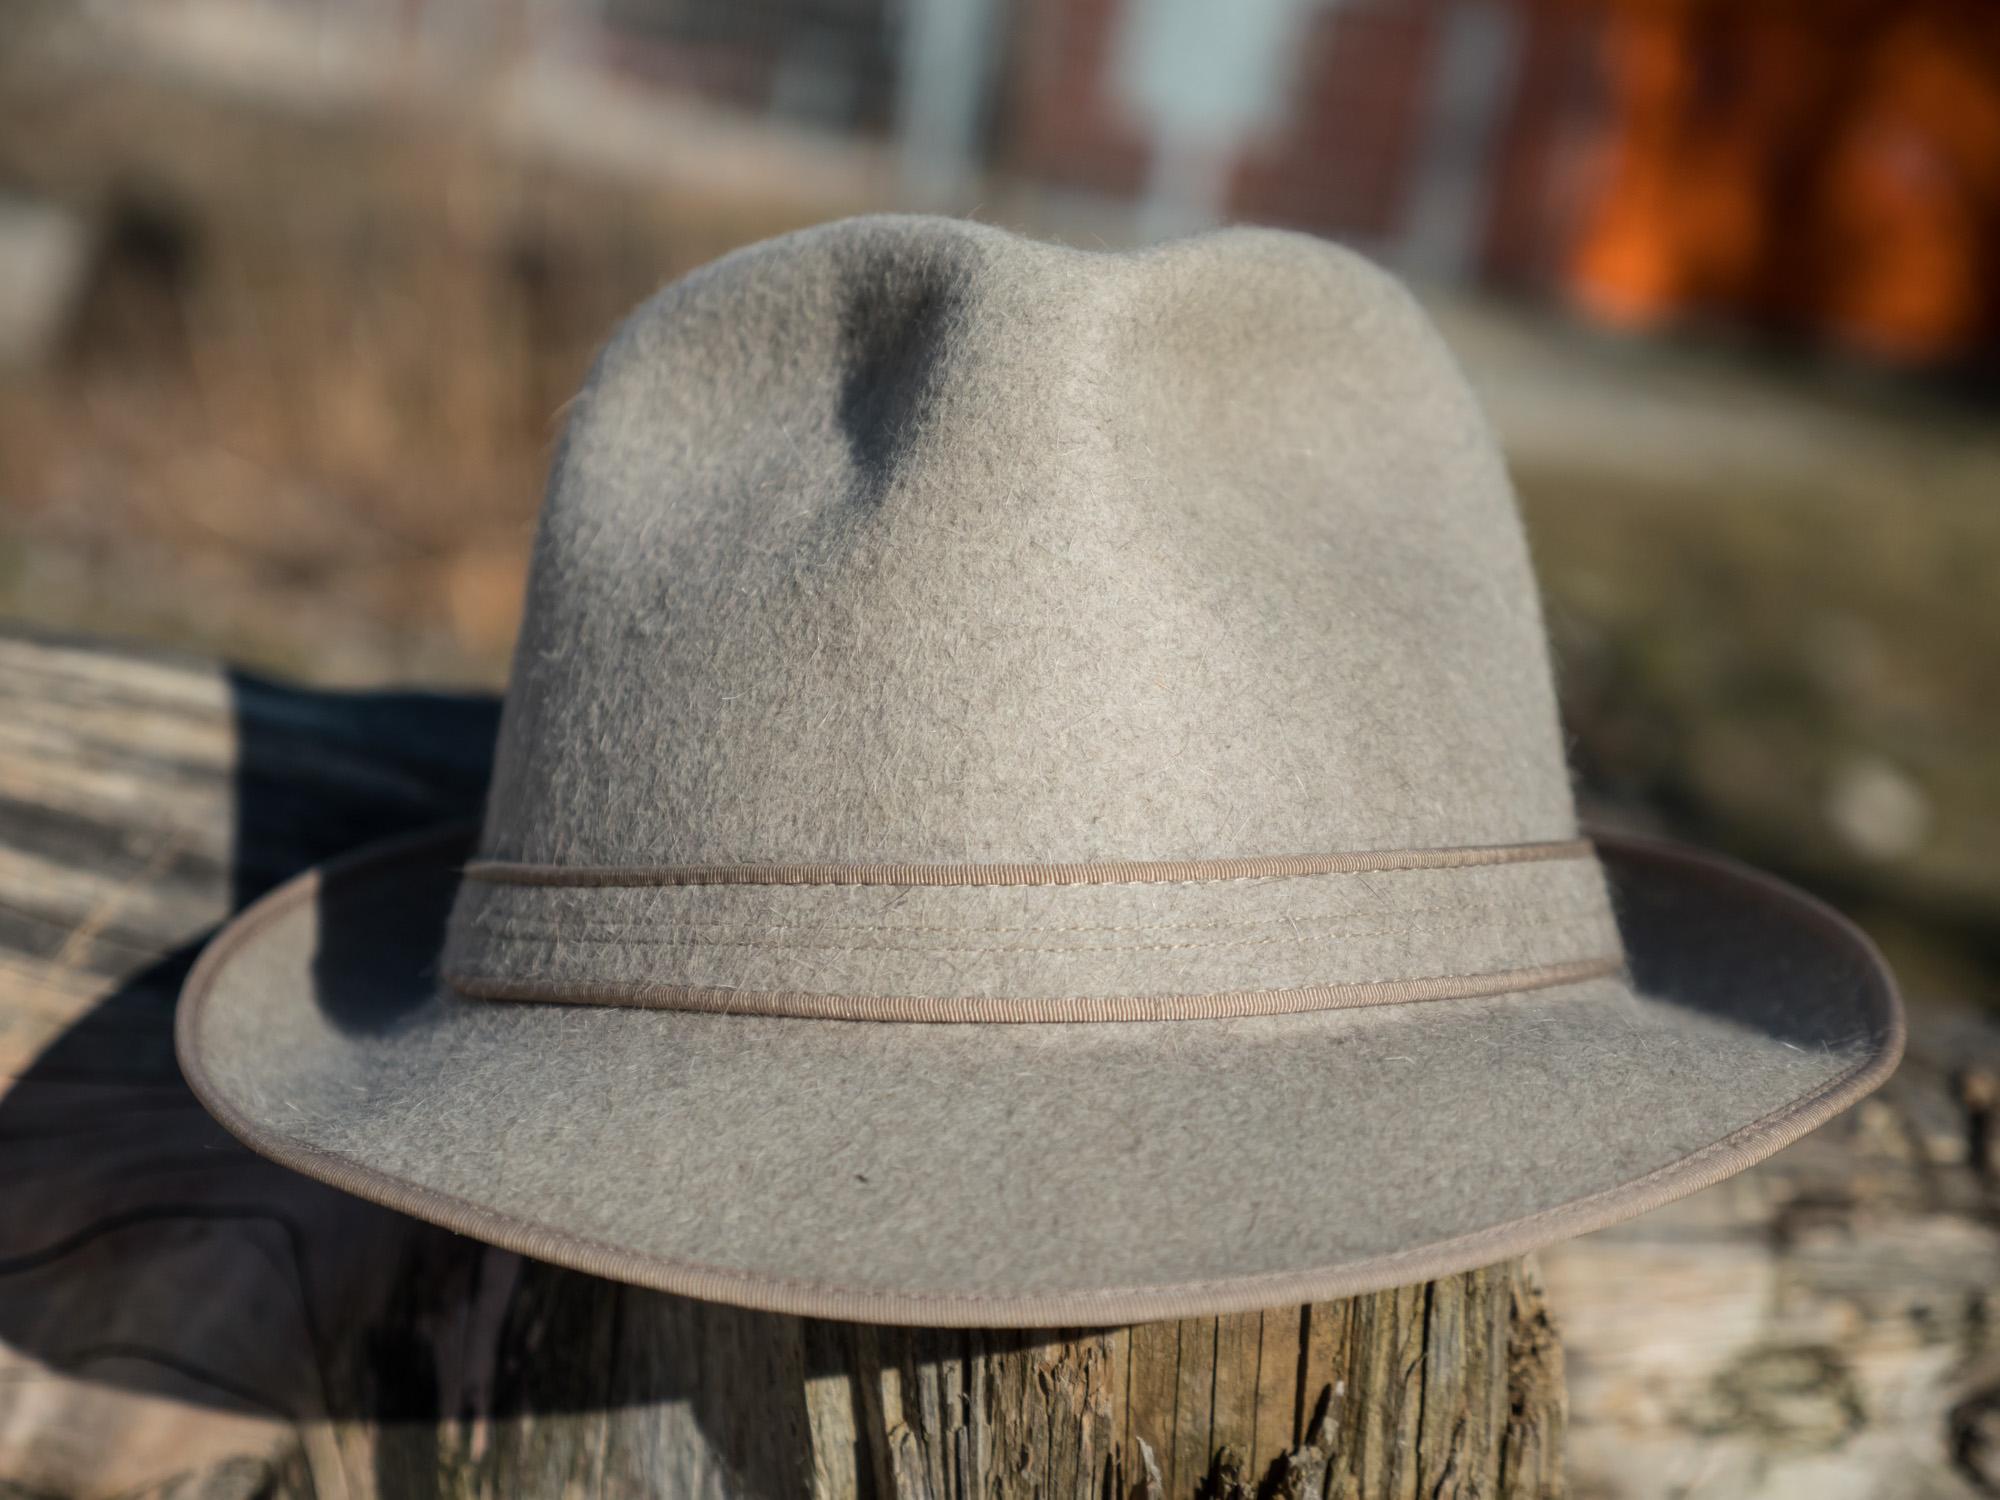 hat-fraenkel-trilby-641-natur-108-web-xl